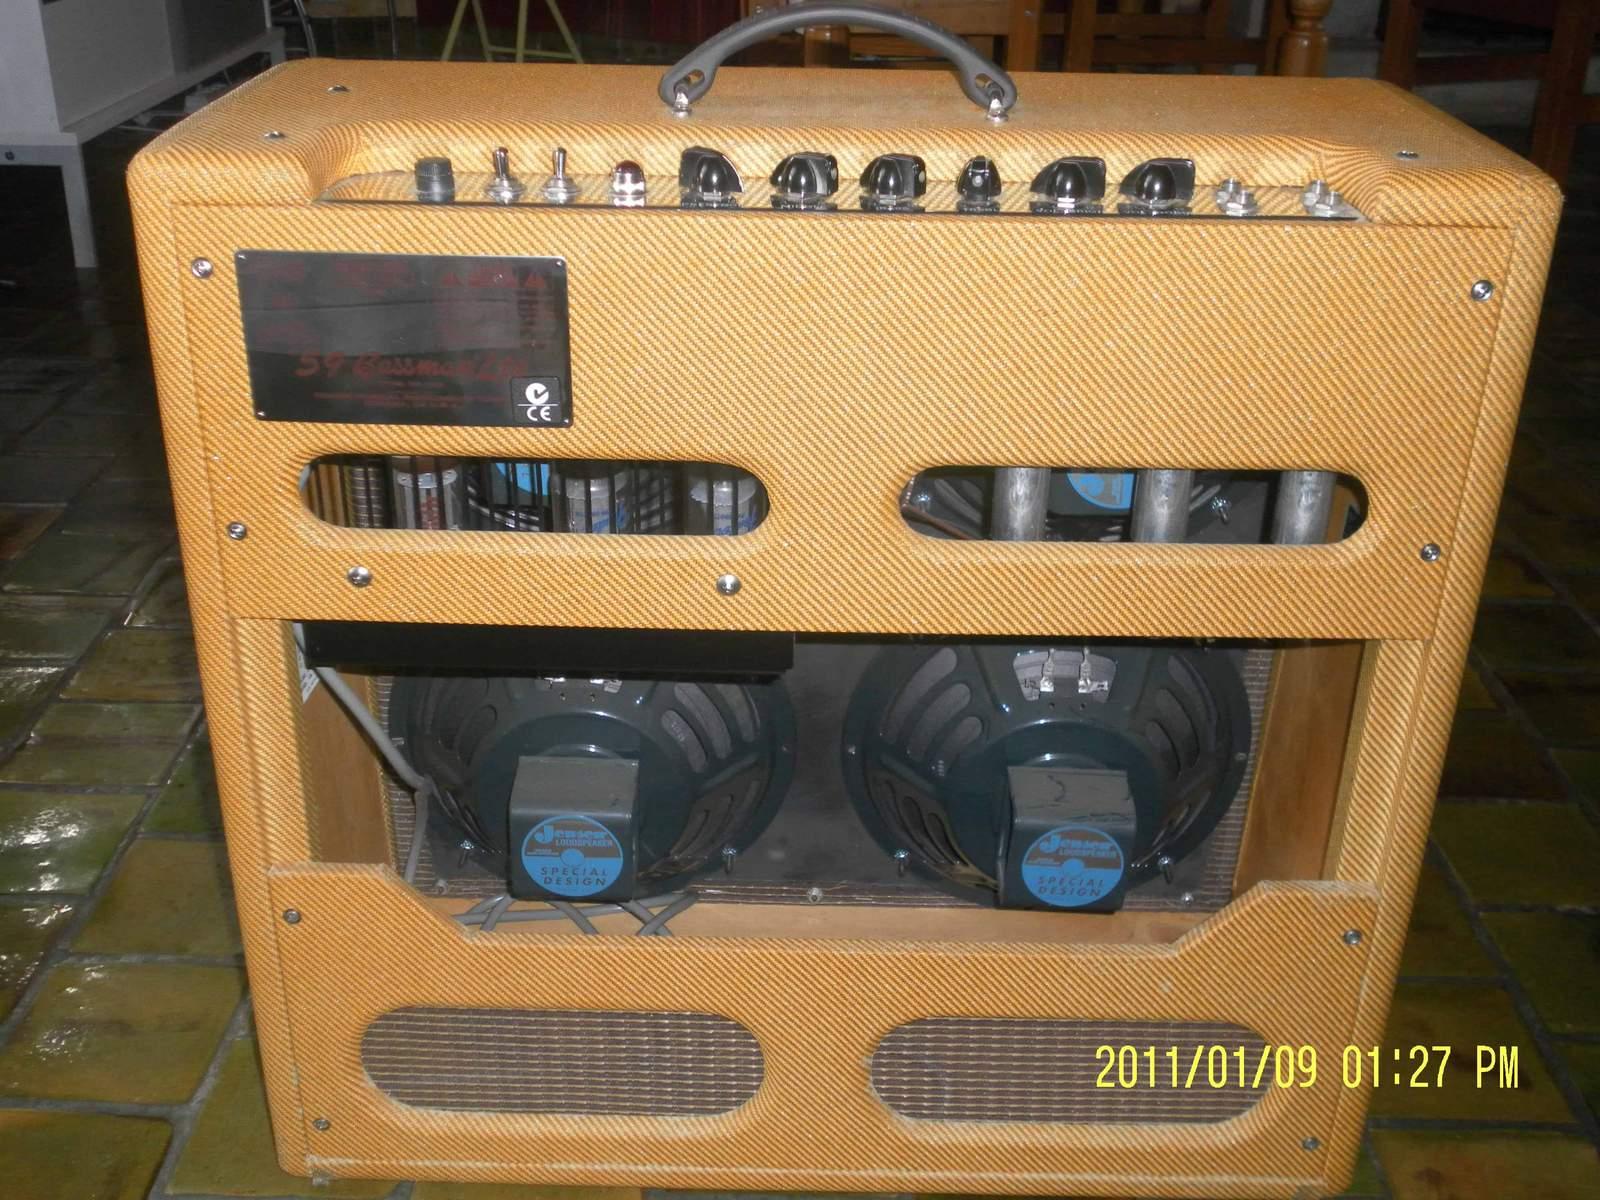 fender vintage reissue 39 59 bassman ltd image 173798 audiofanzine. Black Bedroom Furniture Sets. Home Design Ideas